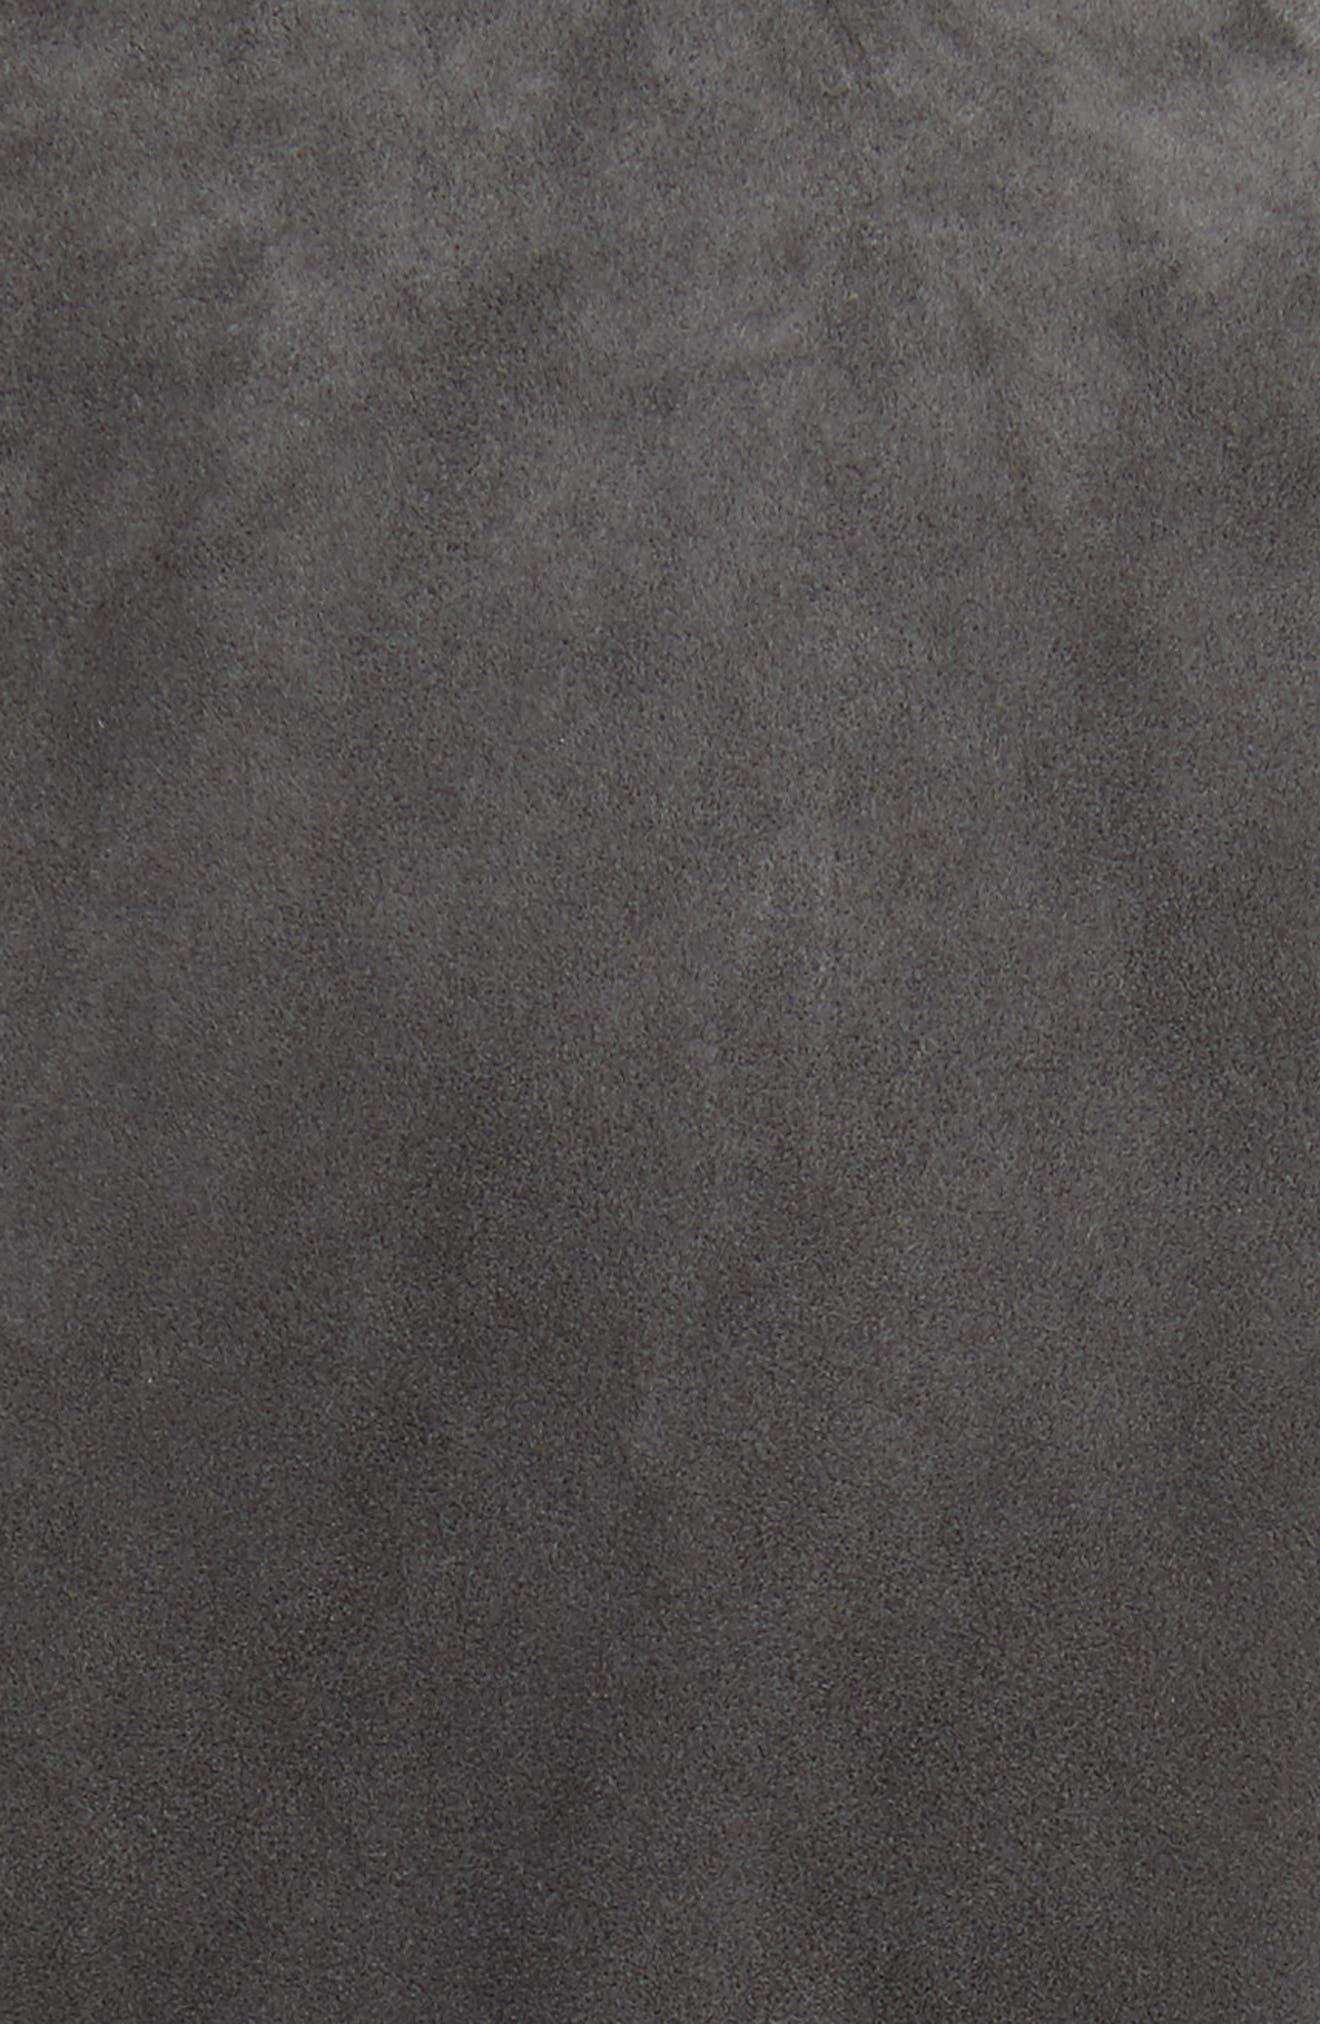 John Varvatos Suede Moto Jacket,                             Alternate thumbnail 5, color,                             Typhon Grey